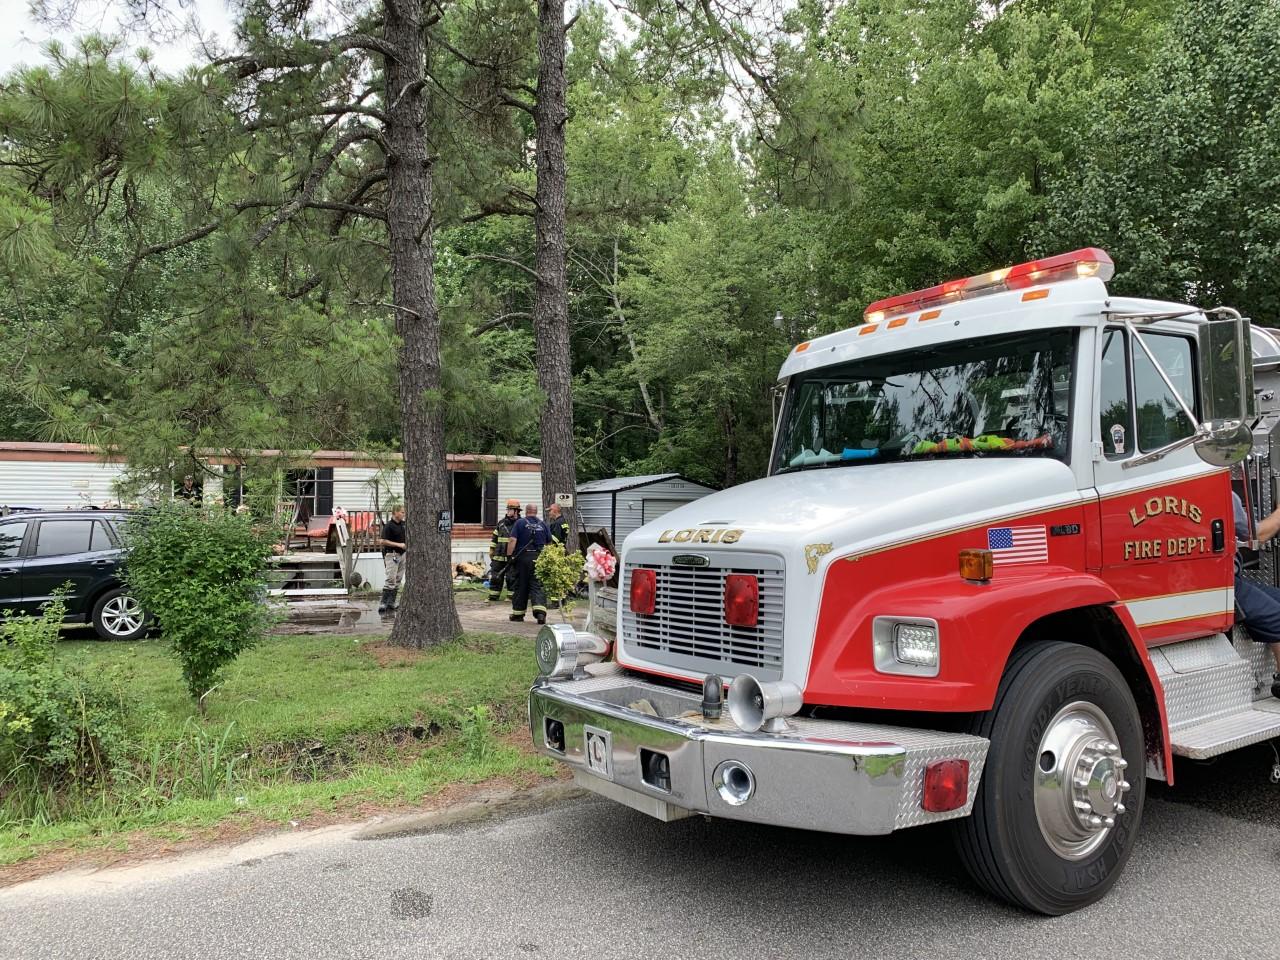 loris mobile home fire